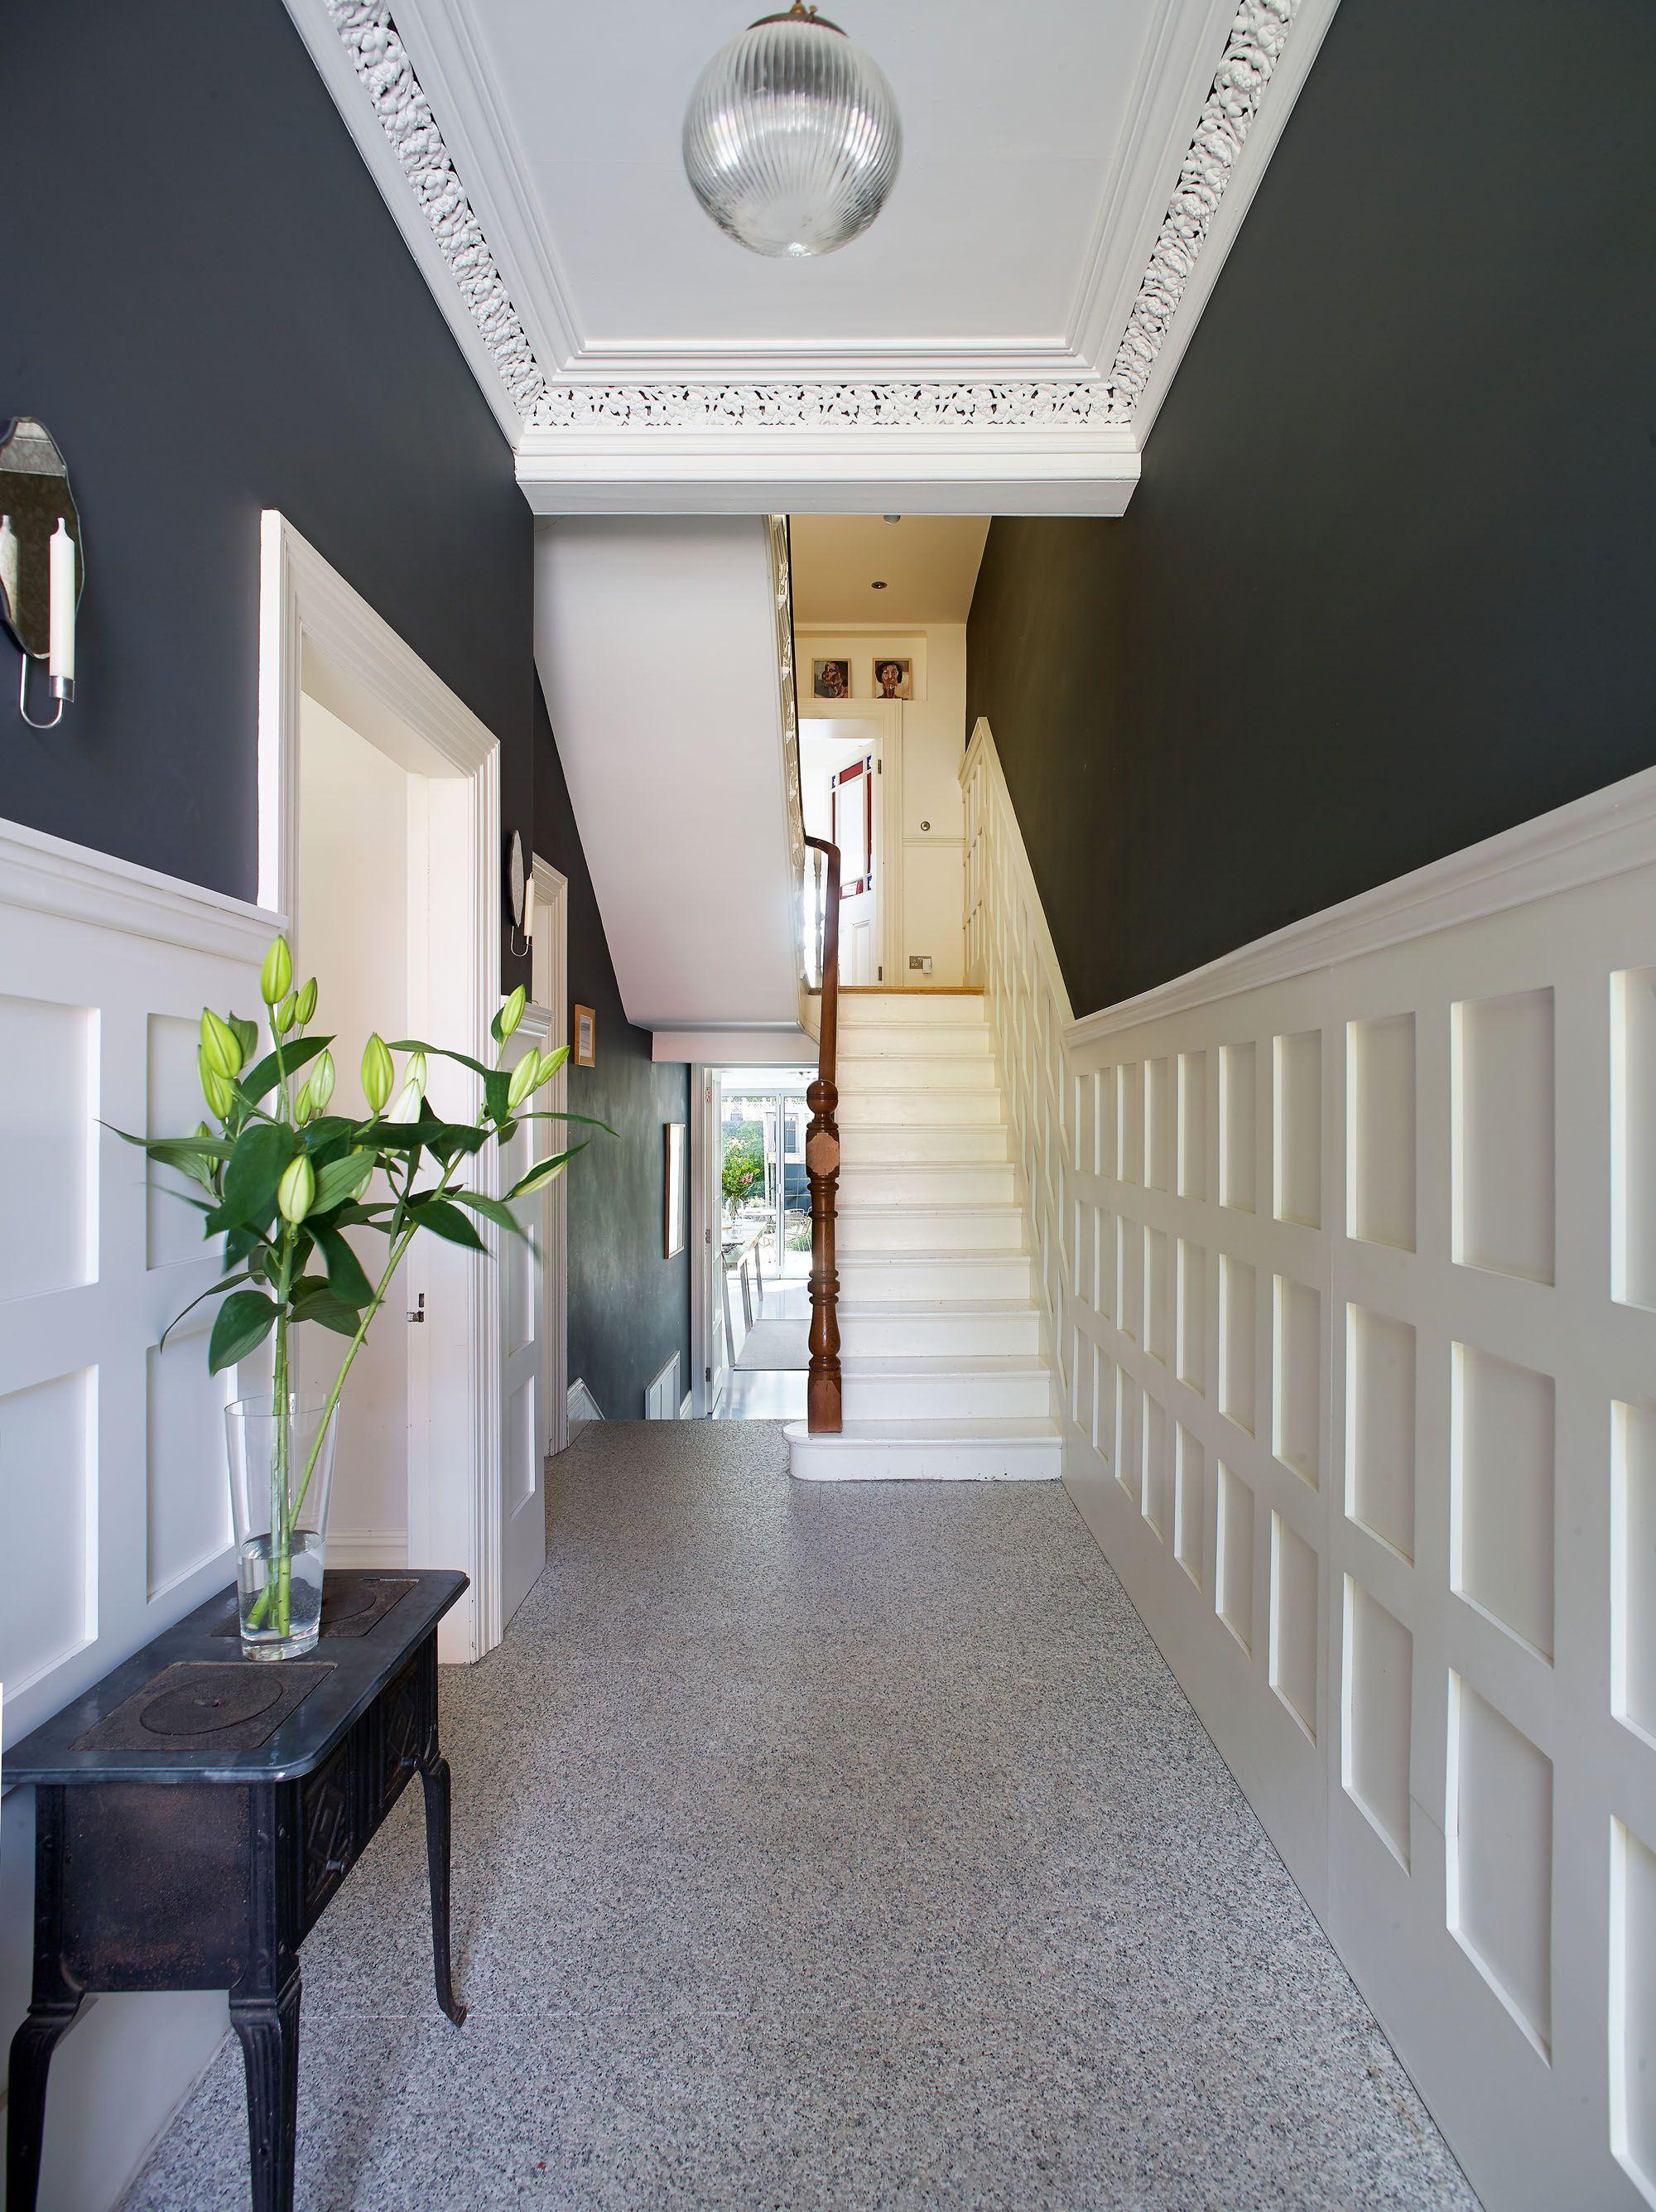 Edwardian hallway lighting  Pin by John on Home Renovations  Pinterest  Hall Entrance halls